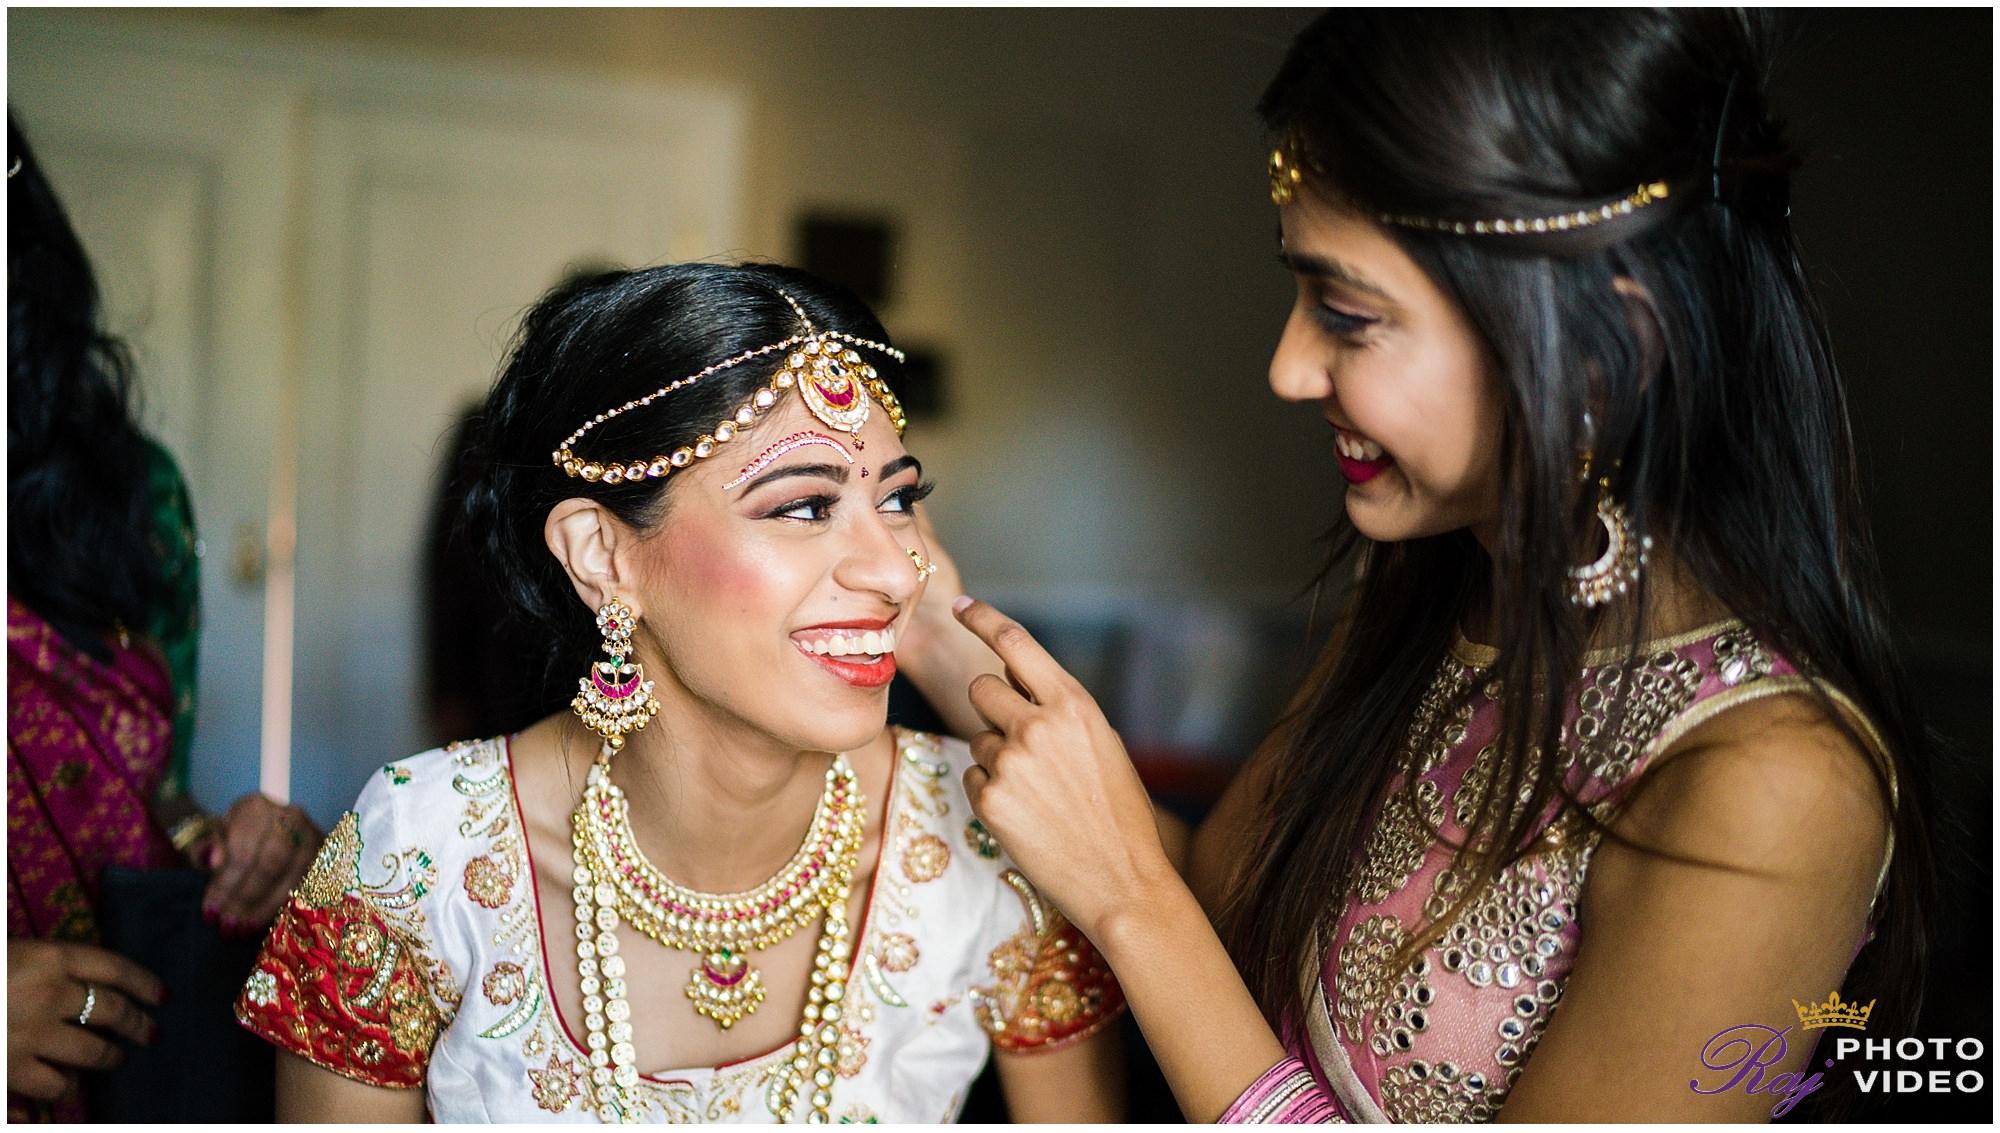 Founders-Inn-and-Spa-Virginia-Beach-VA-Indian-Wedding-Harini-Vivek-27.jpg